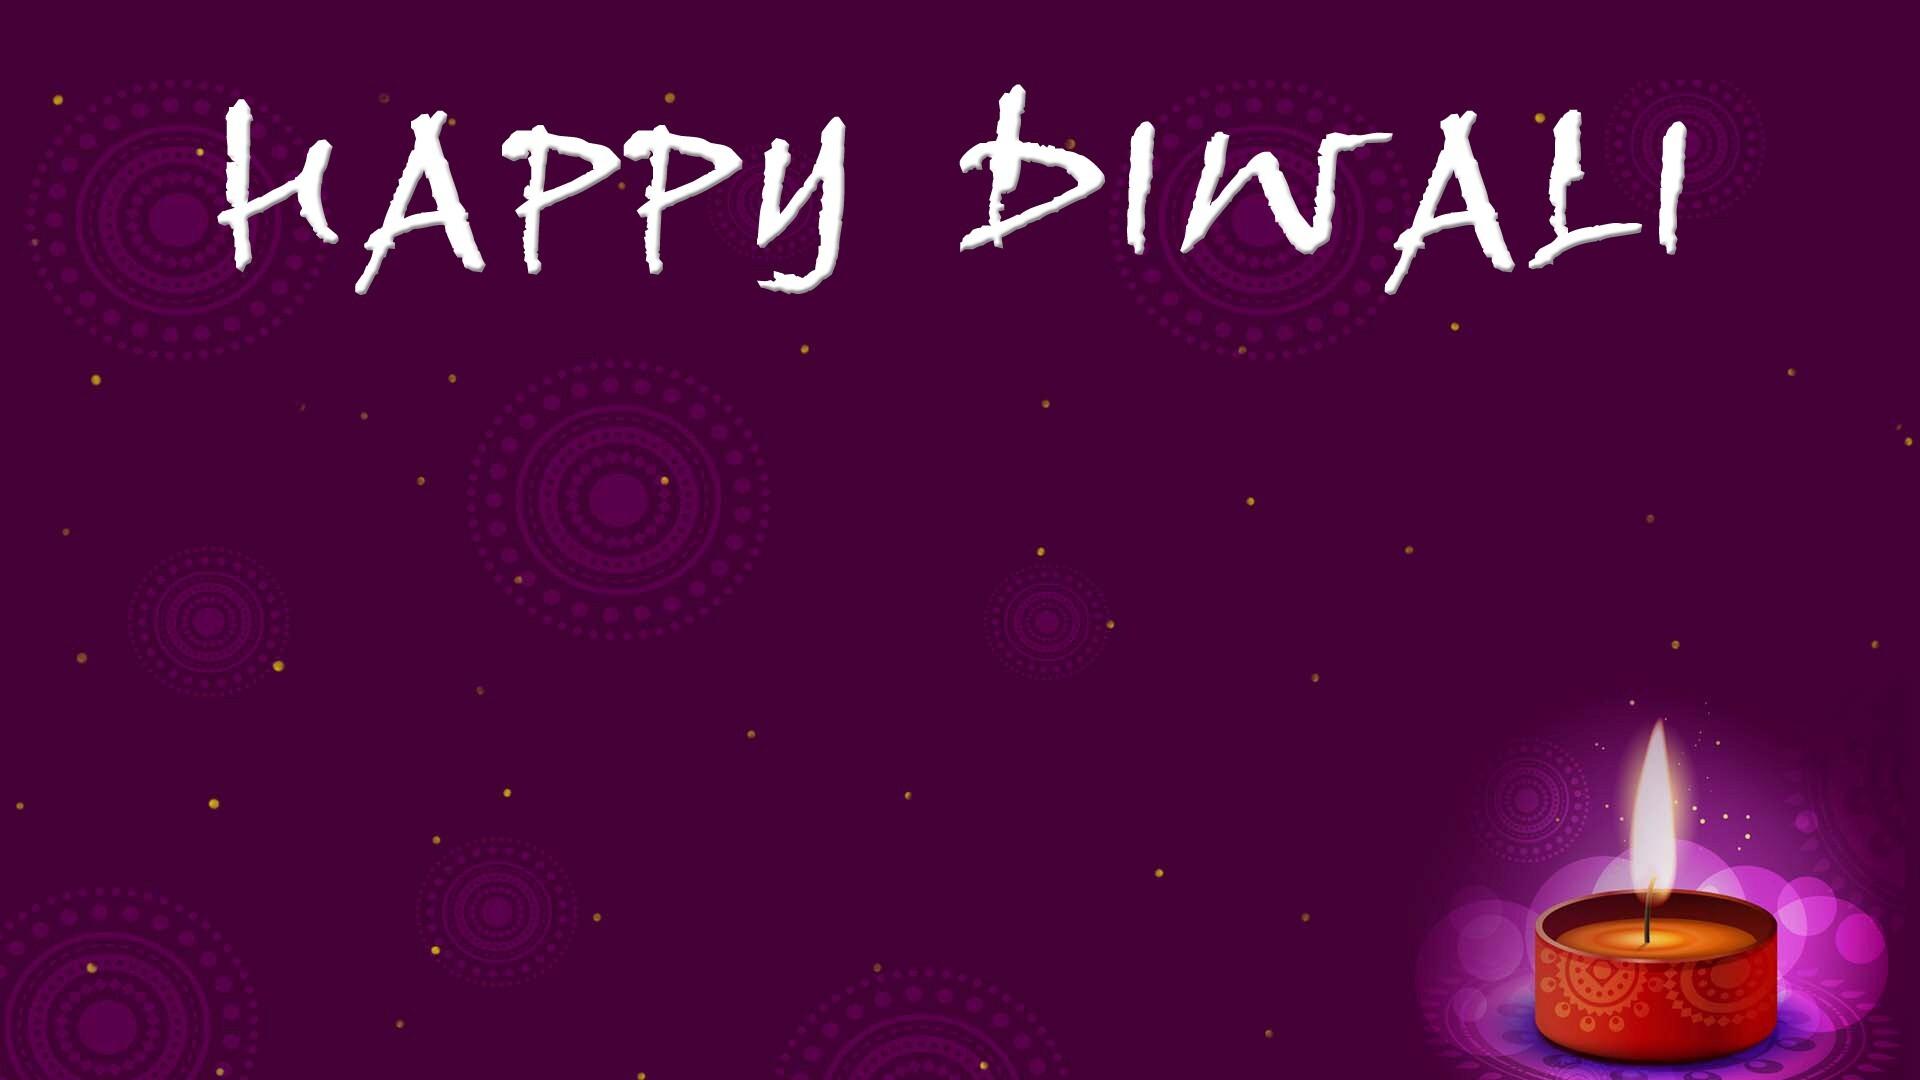 Happy Diwali 2015 Hd Desktop Background Wallpapers For